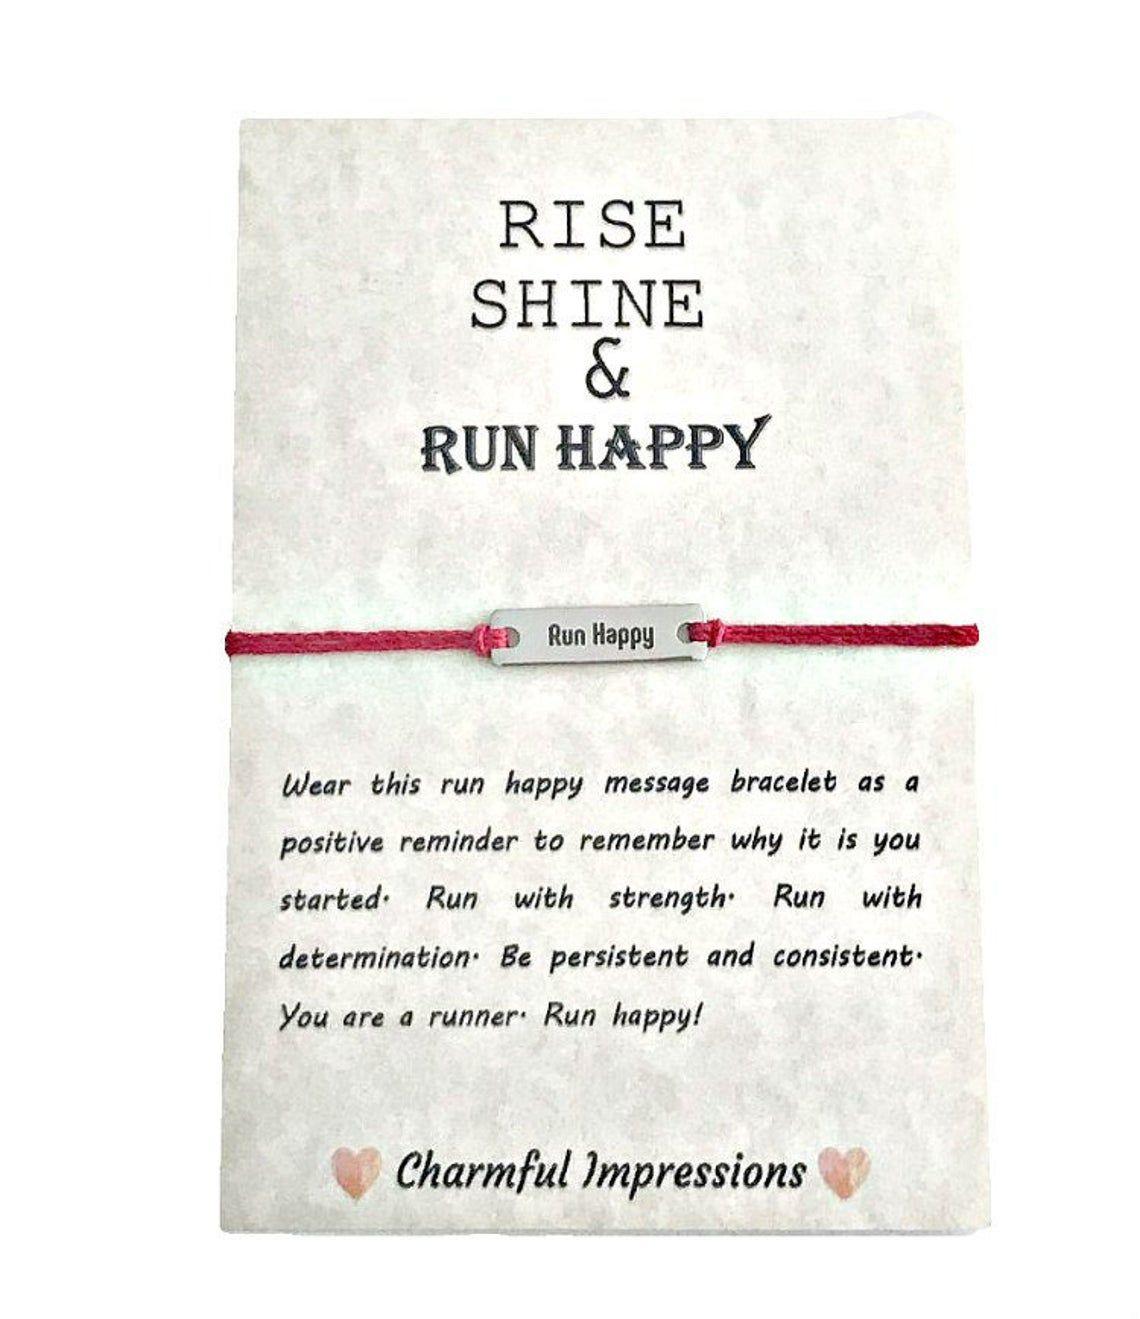 Run Happy Bracelet